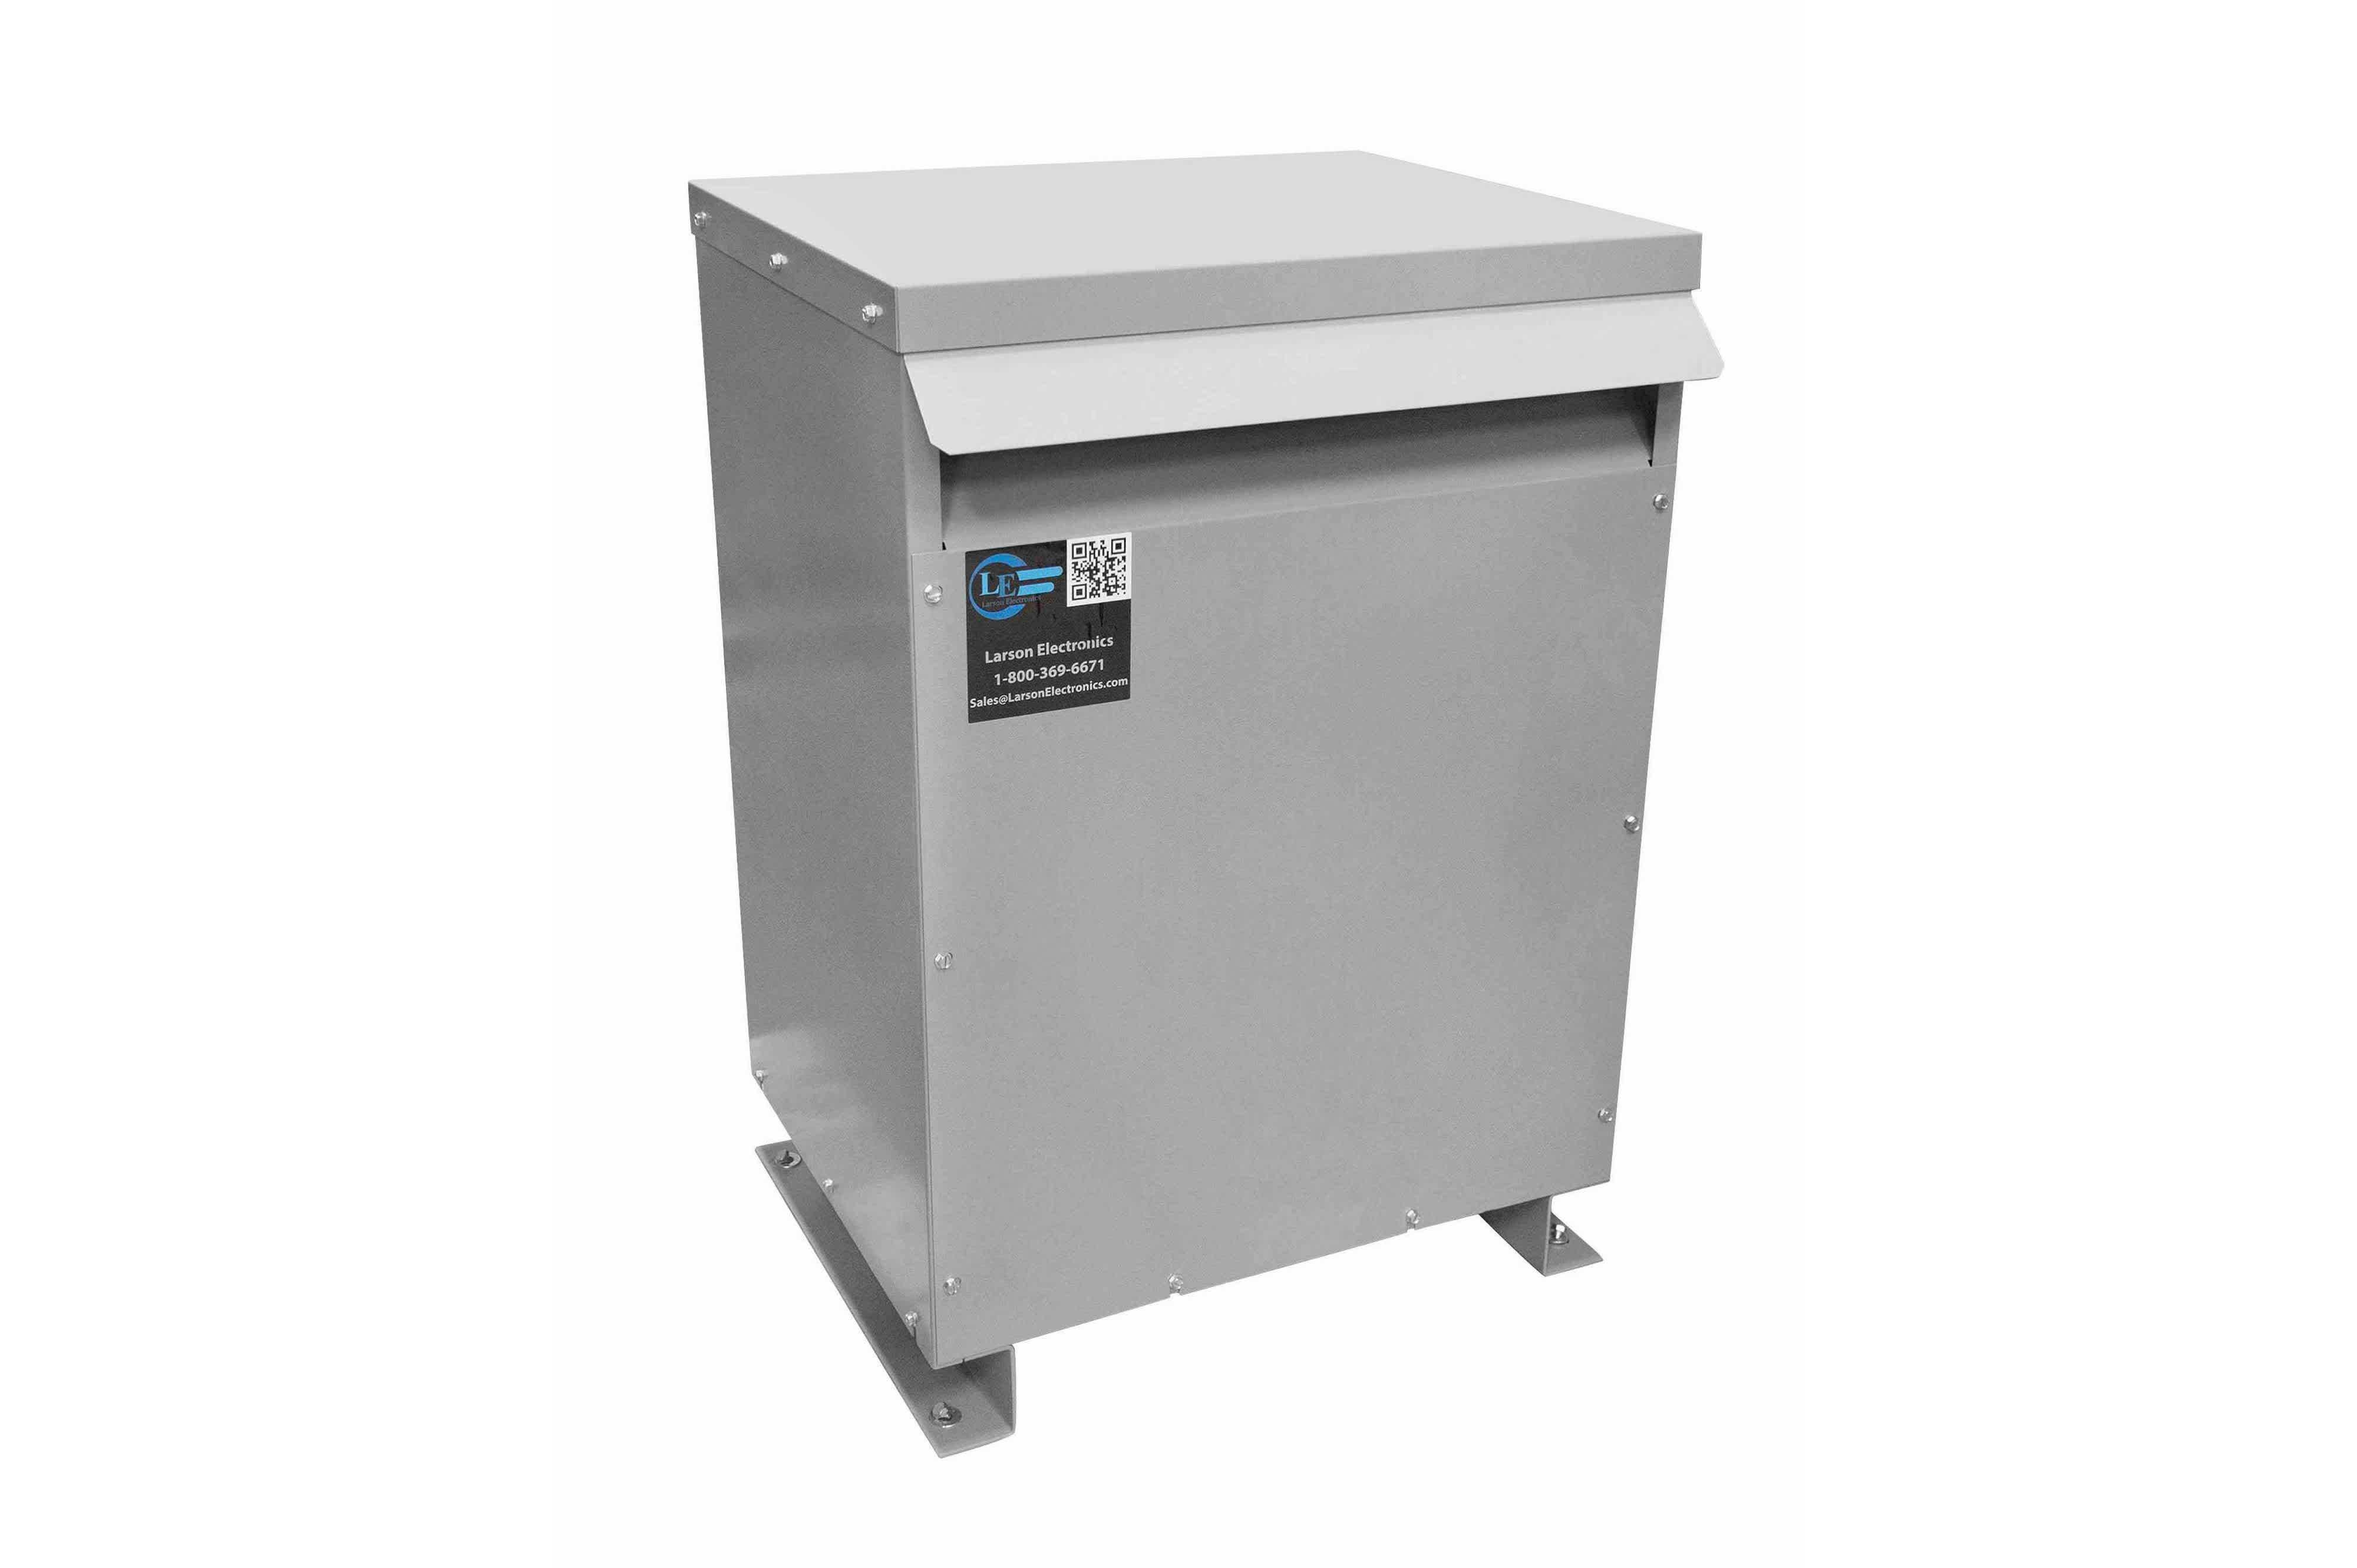 22.5 kVA 3PH Isolation Transformer, 600V Wye Primary, 460V Delta Secondary, N3R, Ventilated, 60 Hz